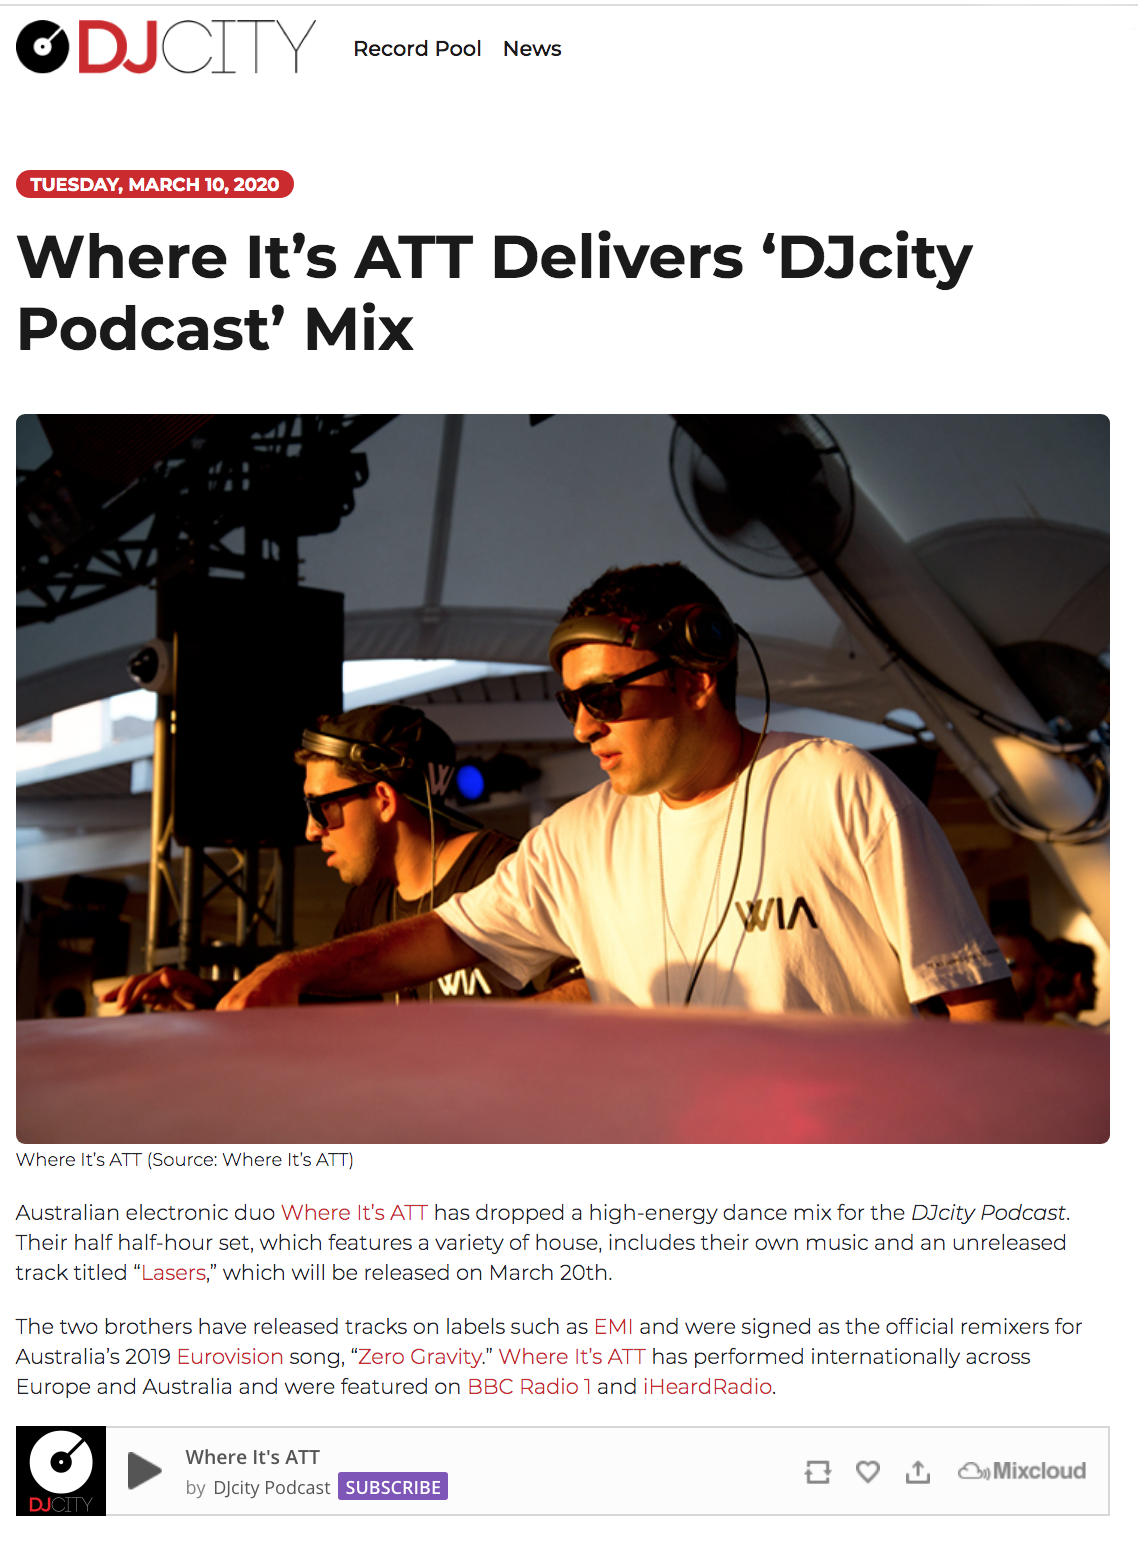 Where It's ATT Delivers 'DJcity Podcast' Mix